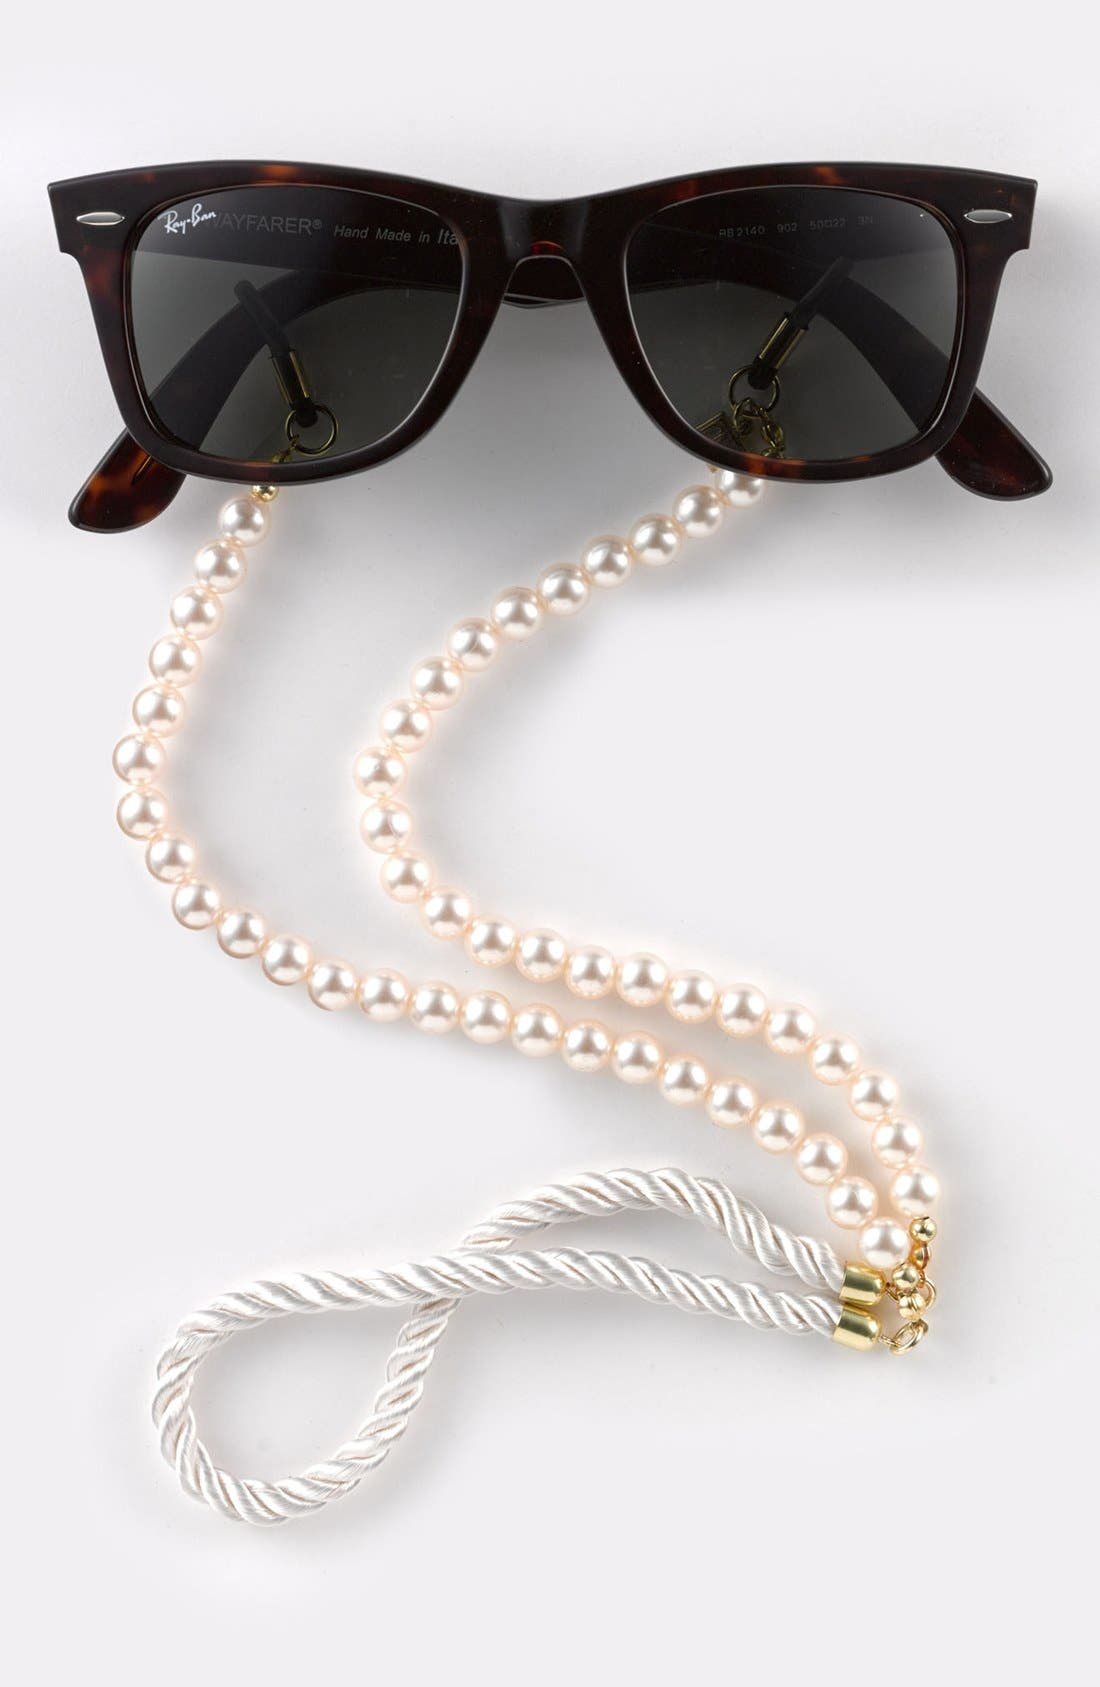 Alternate Image 1 Selected - Corinne McCormack 'Pearls' Eyewear Chain (Nordstrom Exclusive)